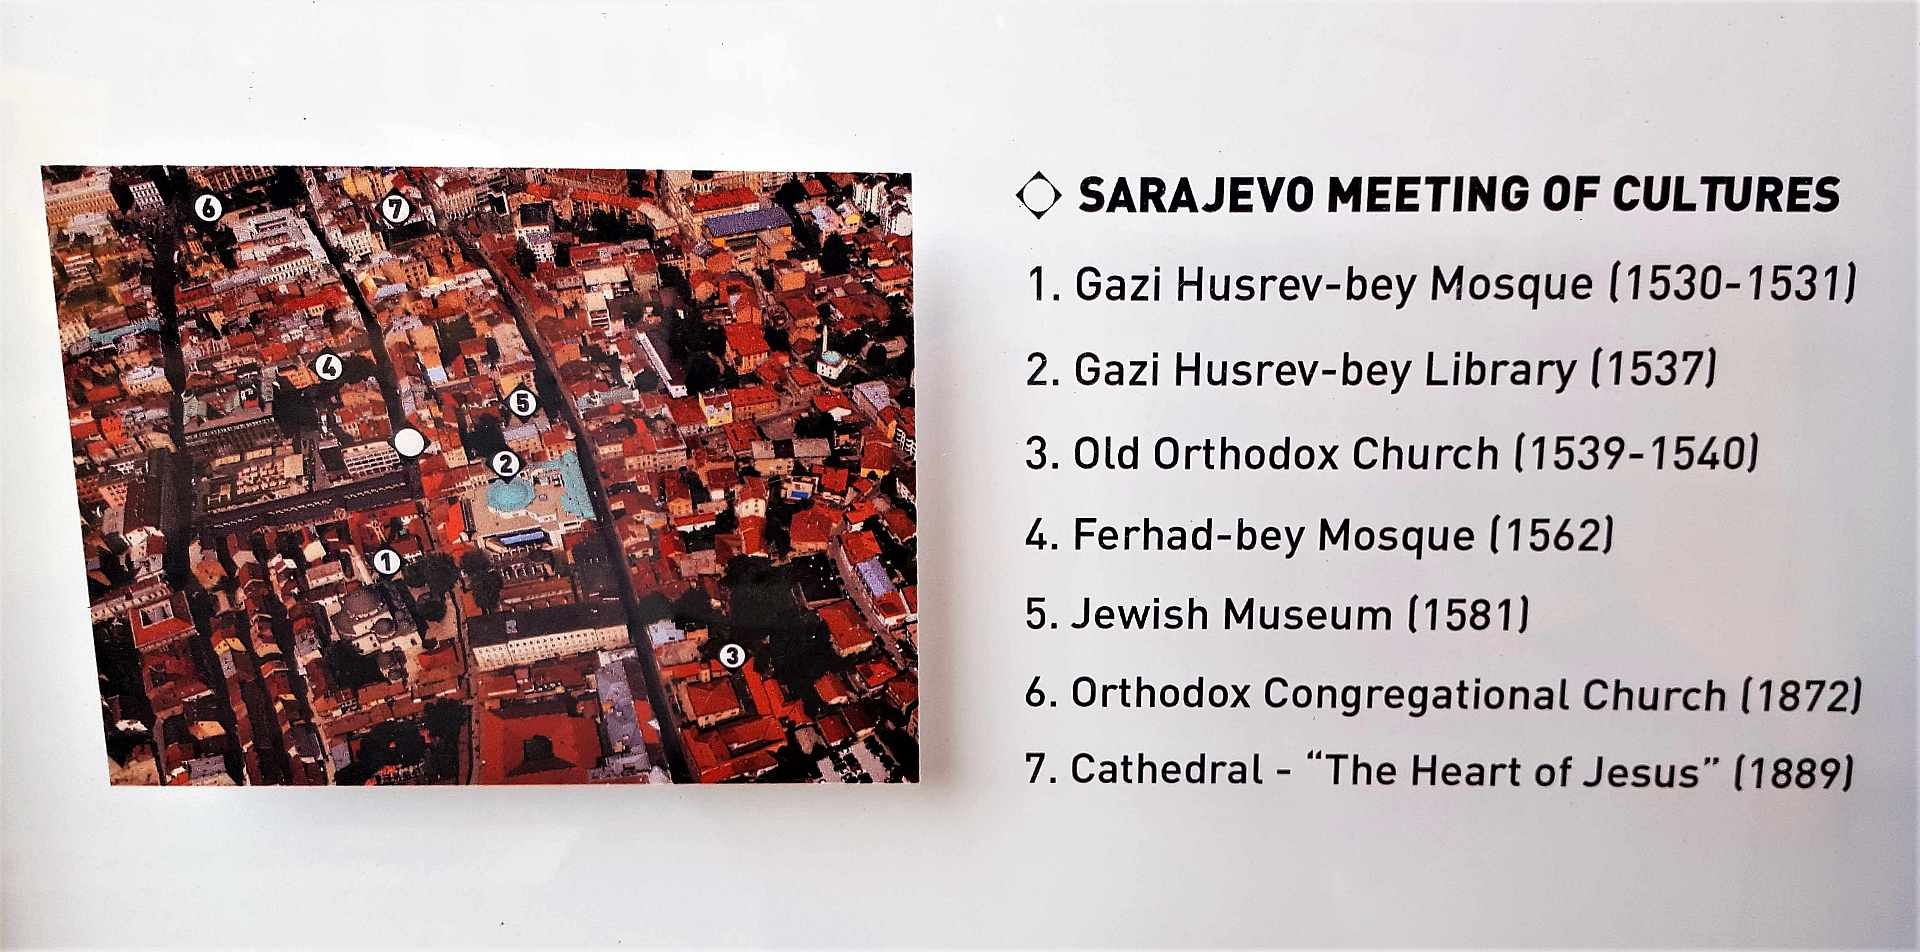 Top atractii Sarajevo - meeting of cultures trivo.ro